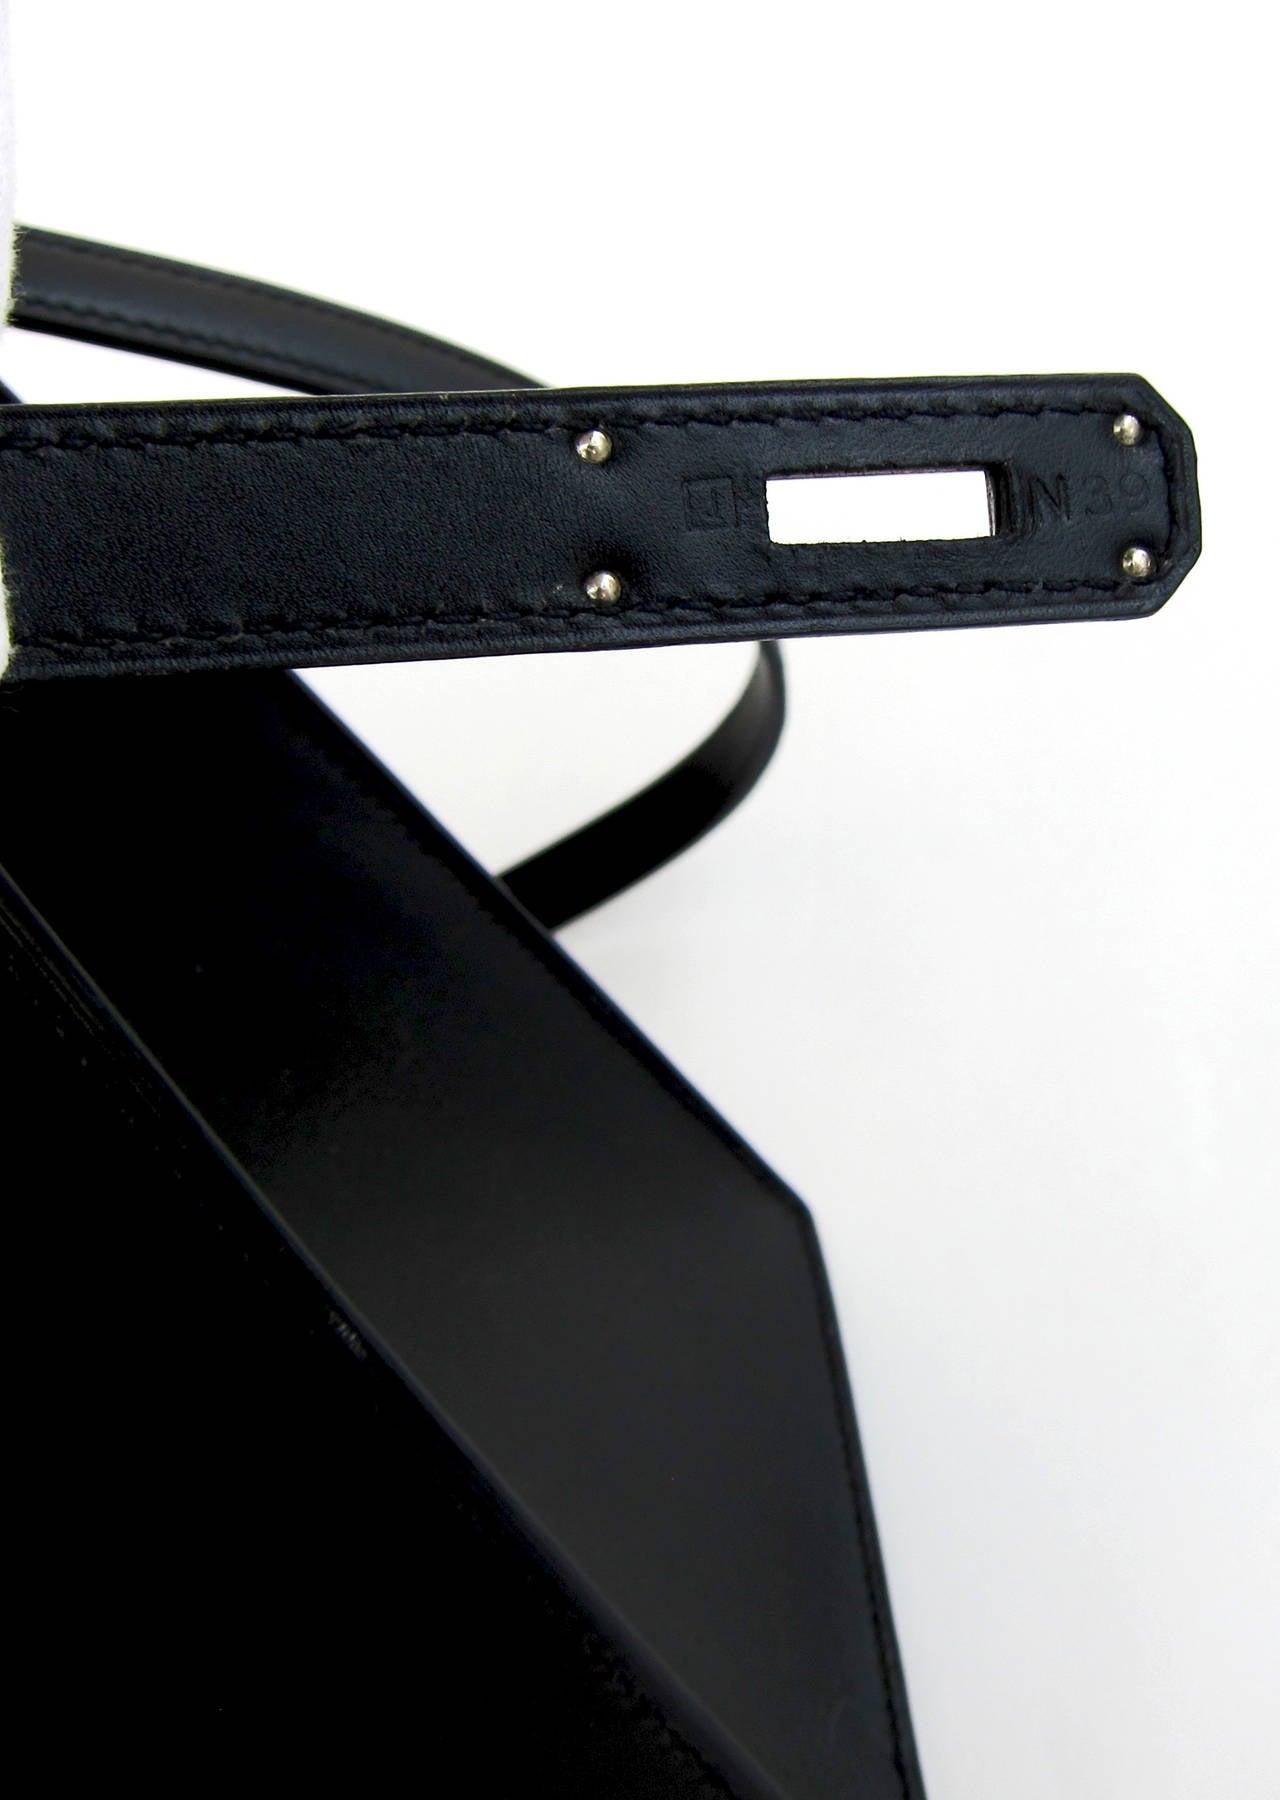 hermes orange bag - hermes kelly bag 32cm sellier black box palladium hardware, best ...